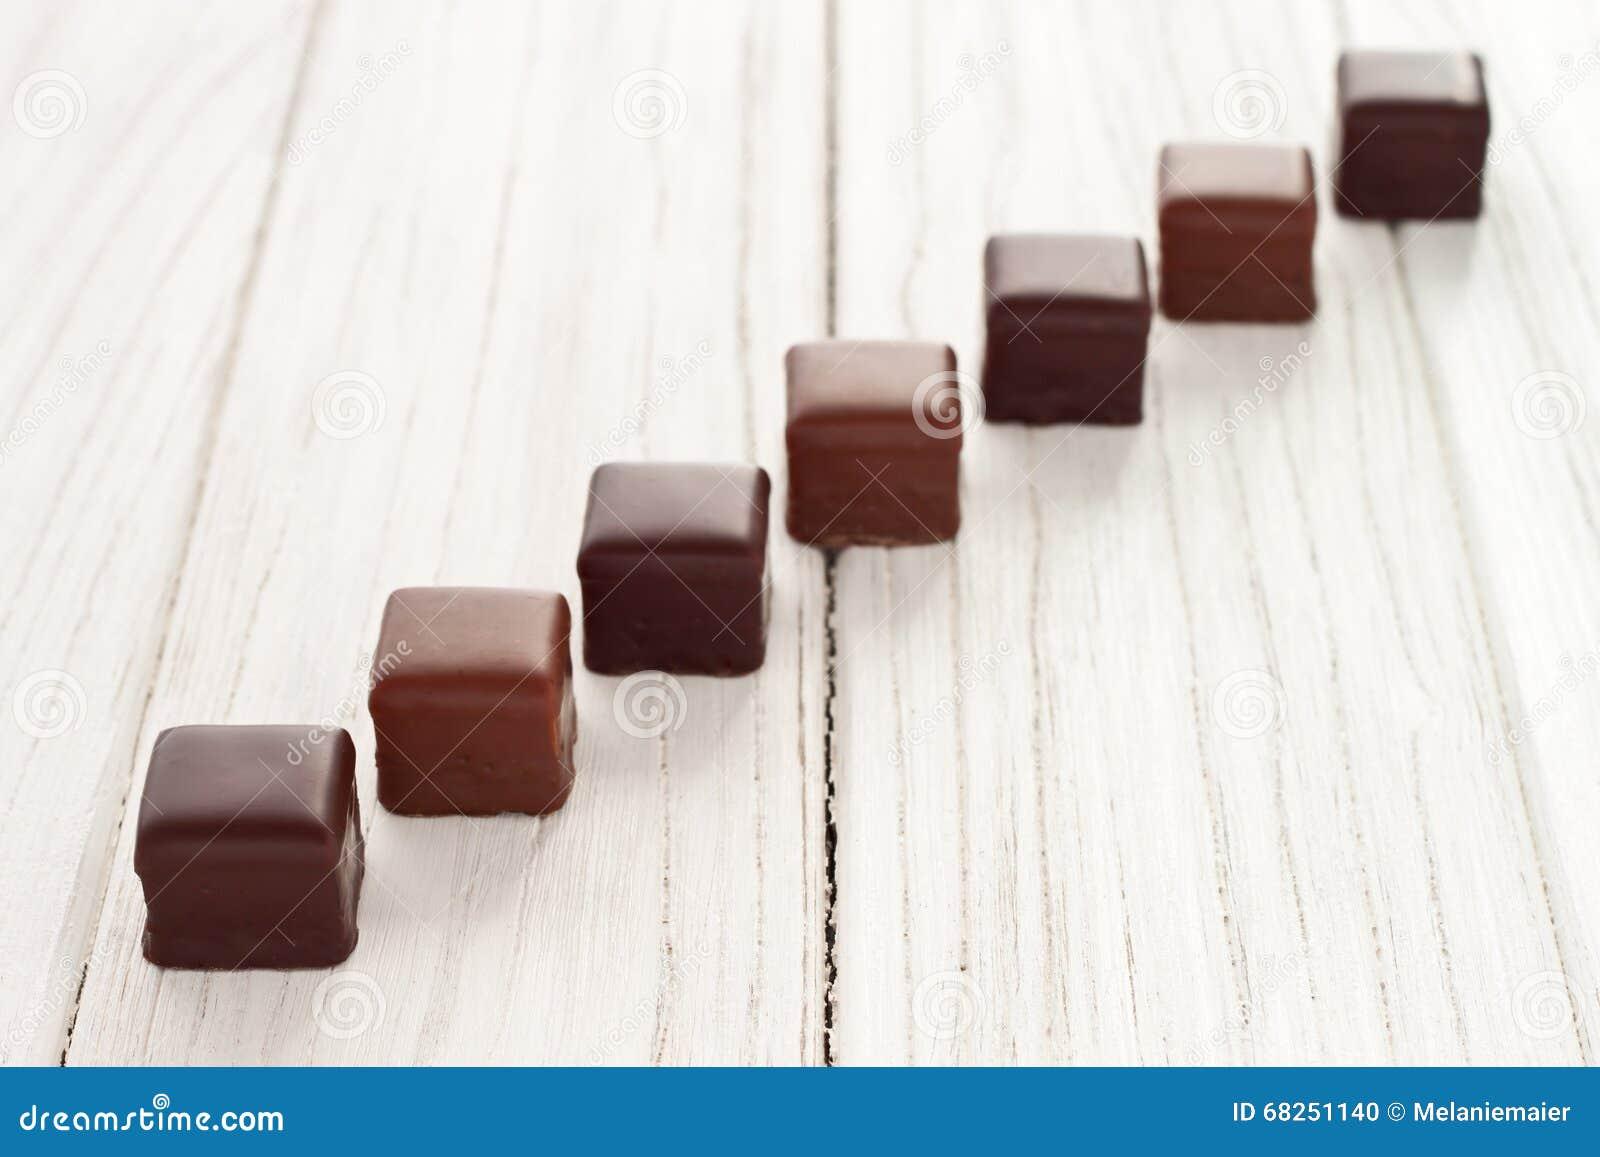 Chocolate dominos stock photo. Image of copy, chocolate - 68251140